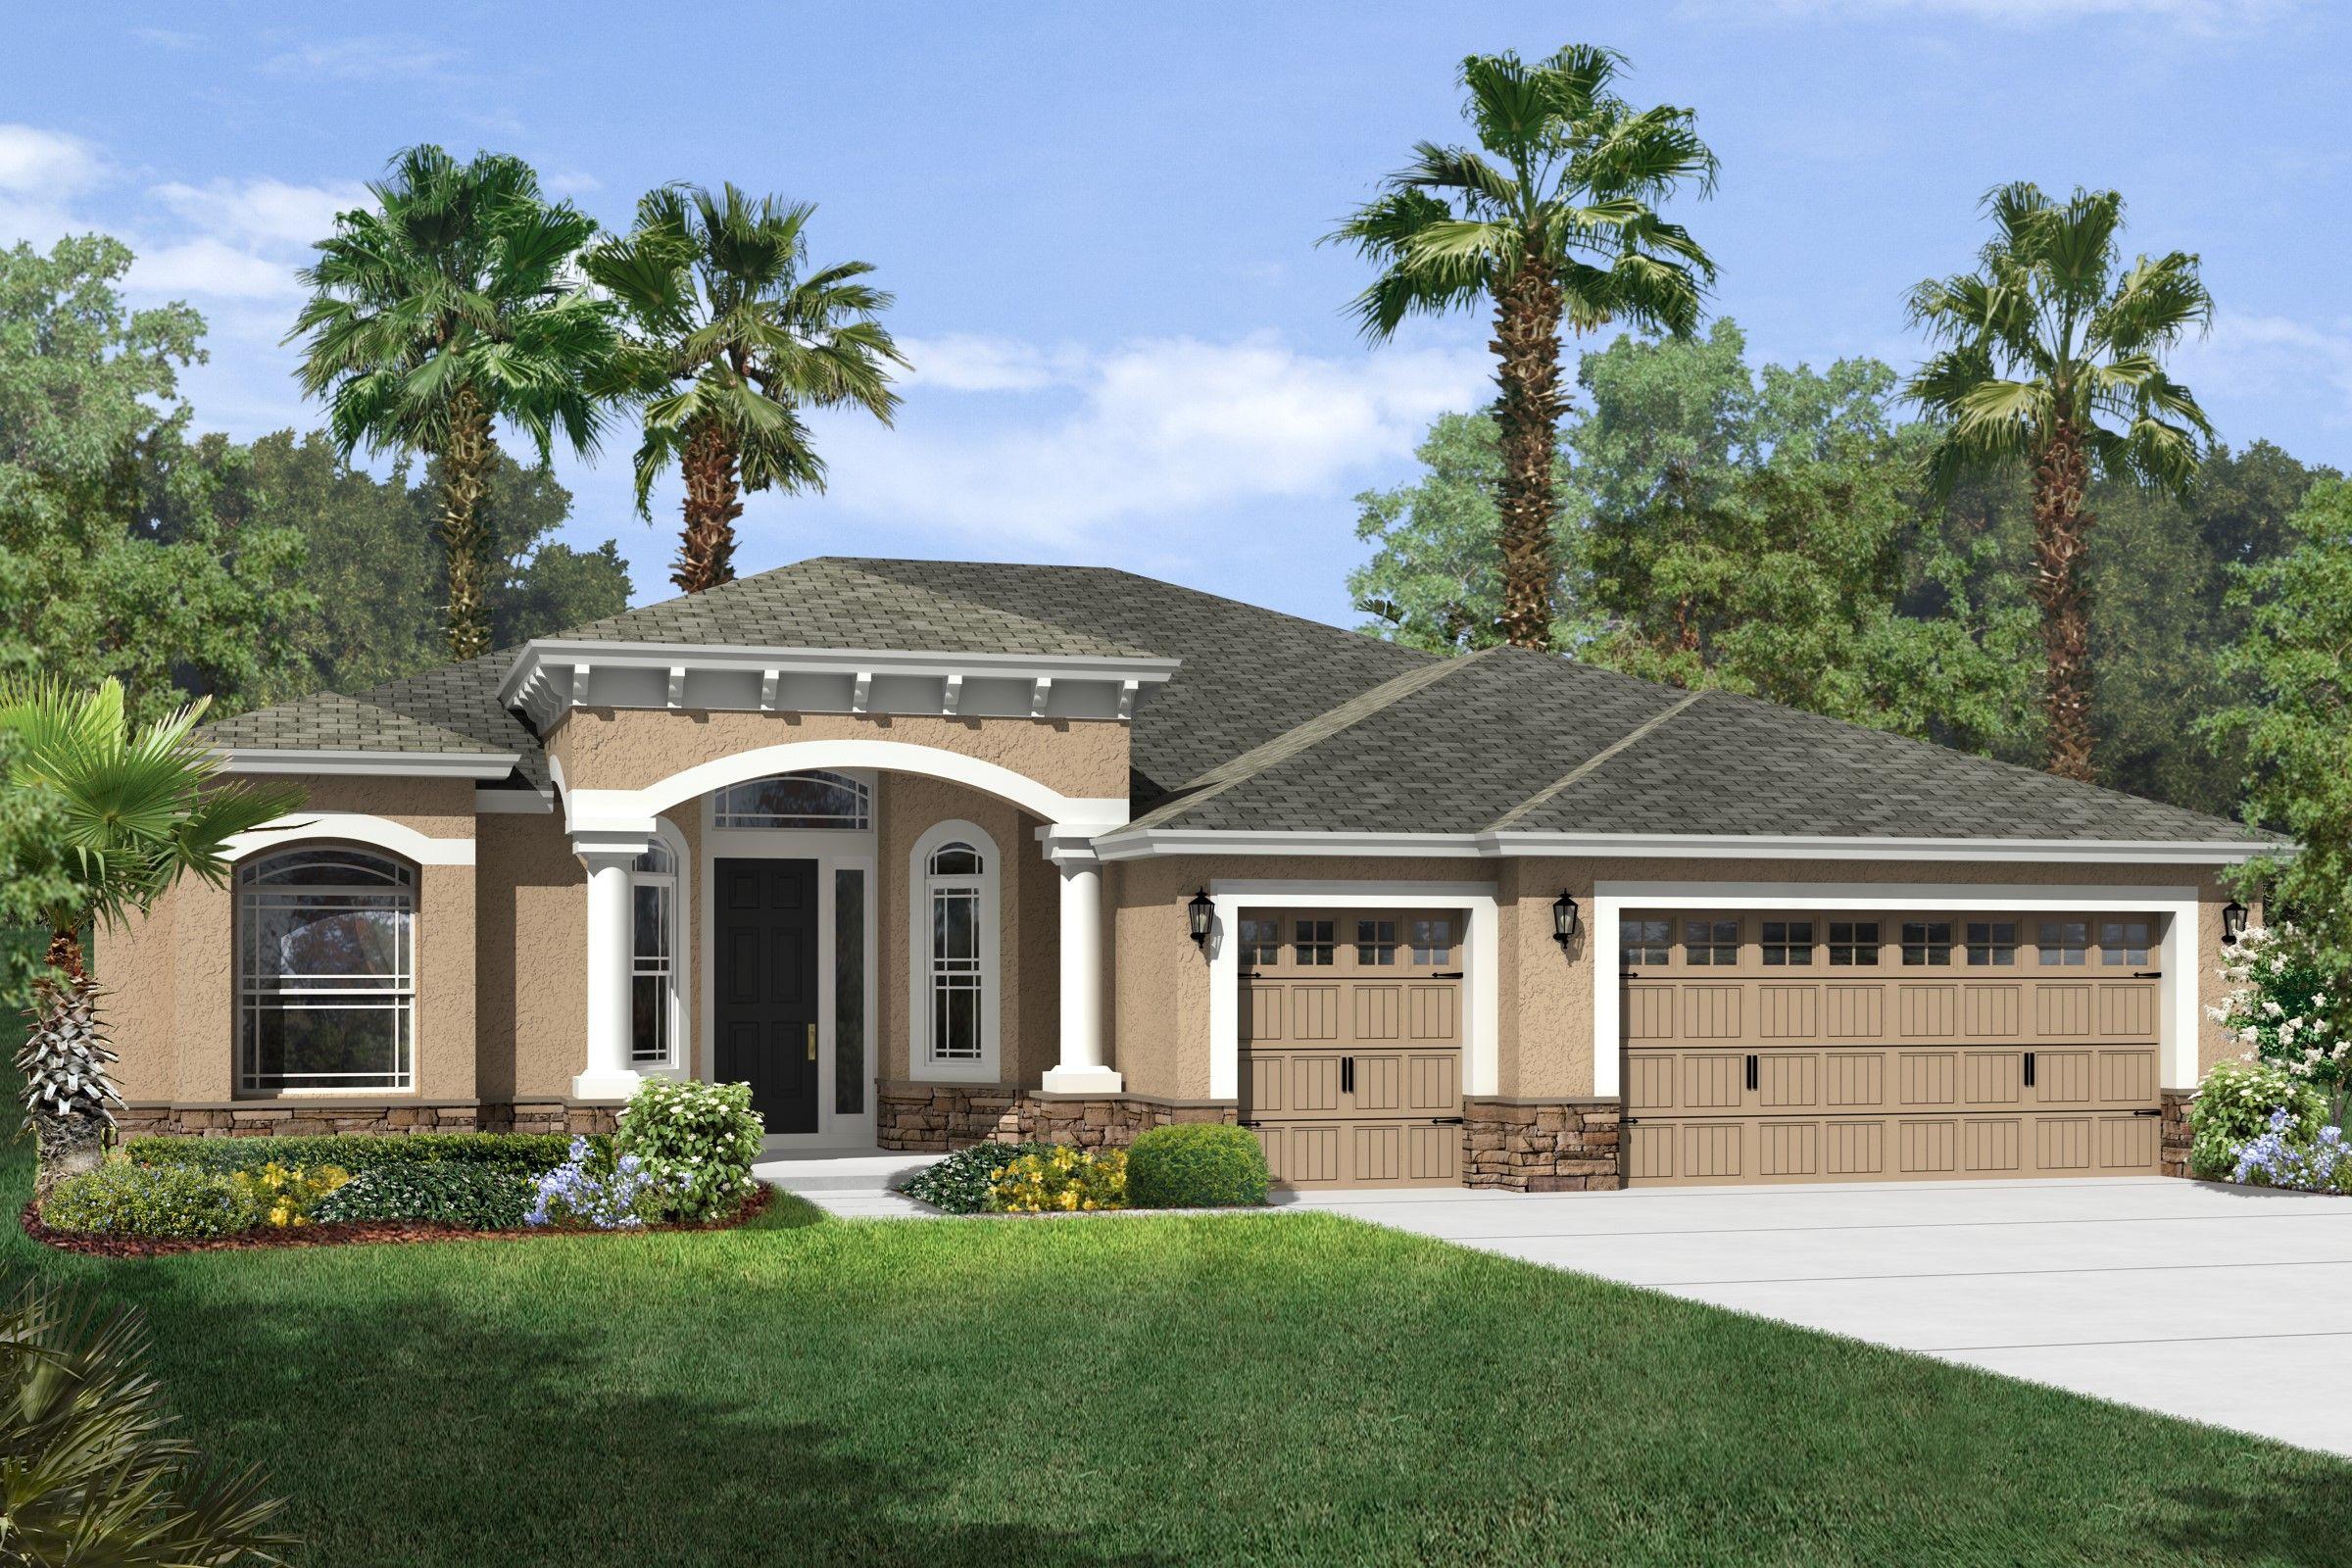 The landings at lake parker new homes in lakeland fl by k for Florida home designs lakeland fl